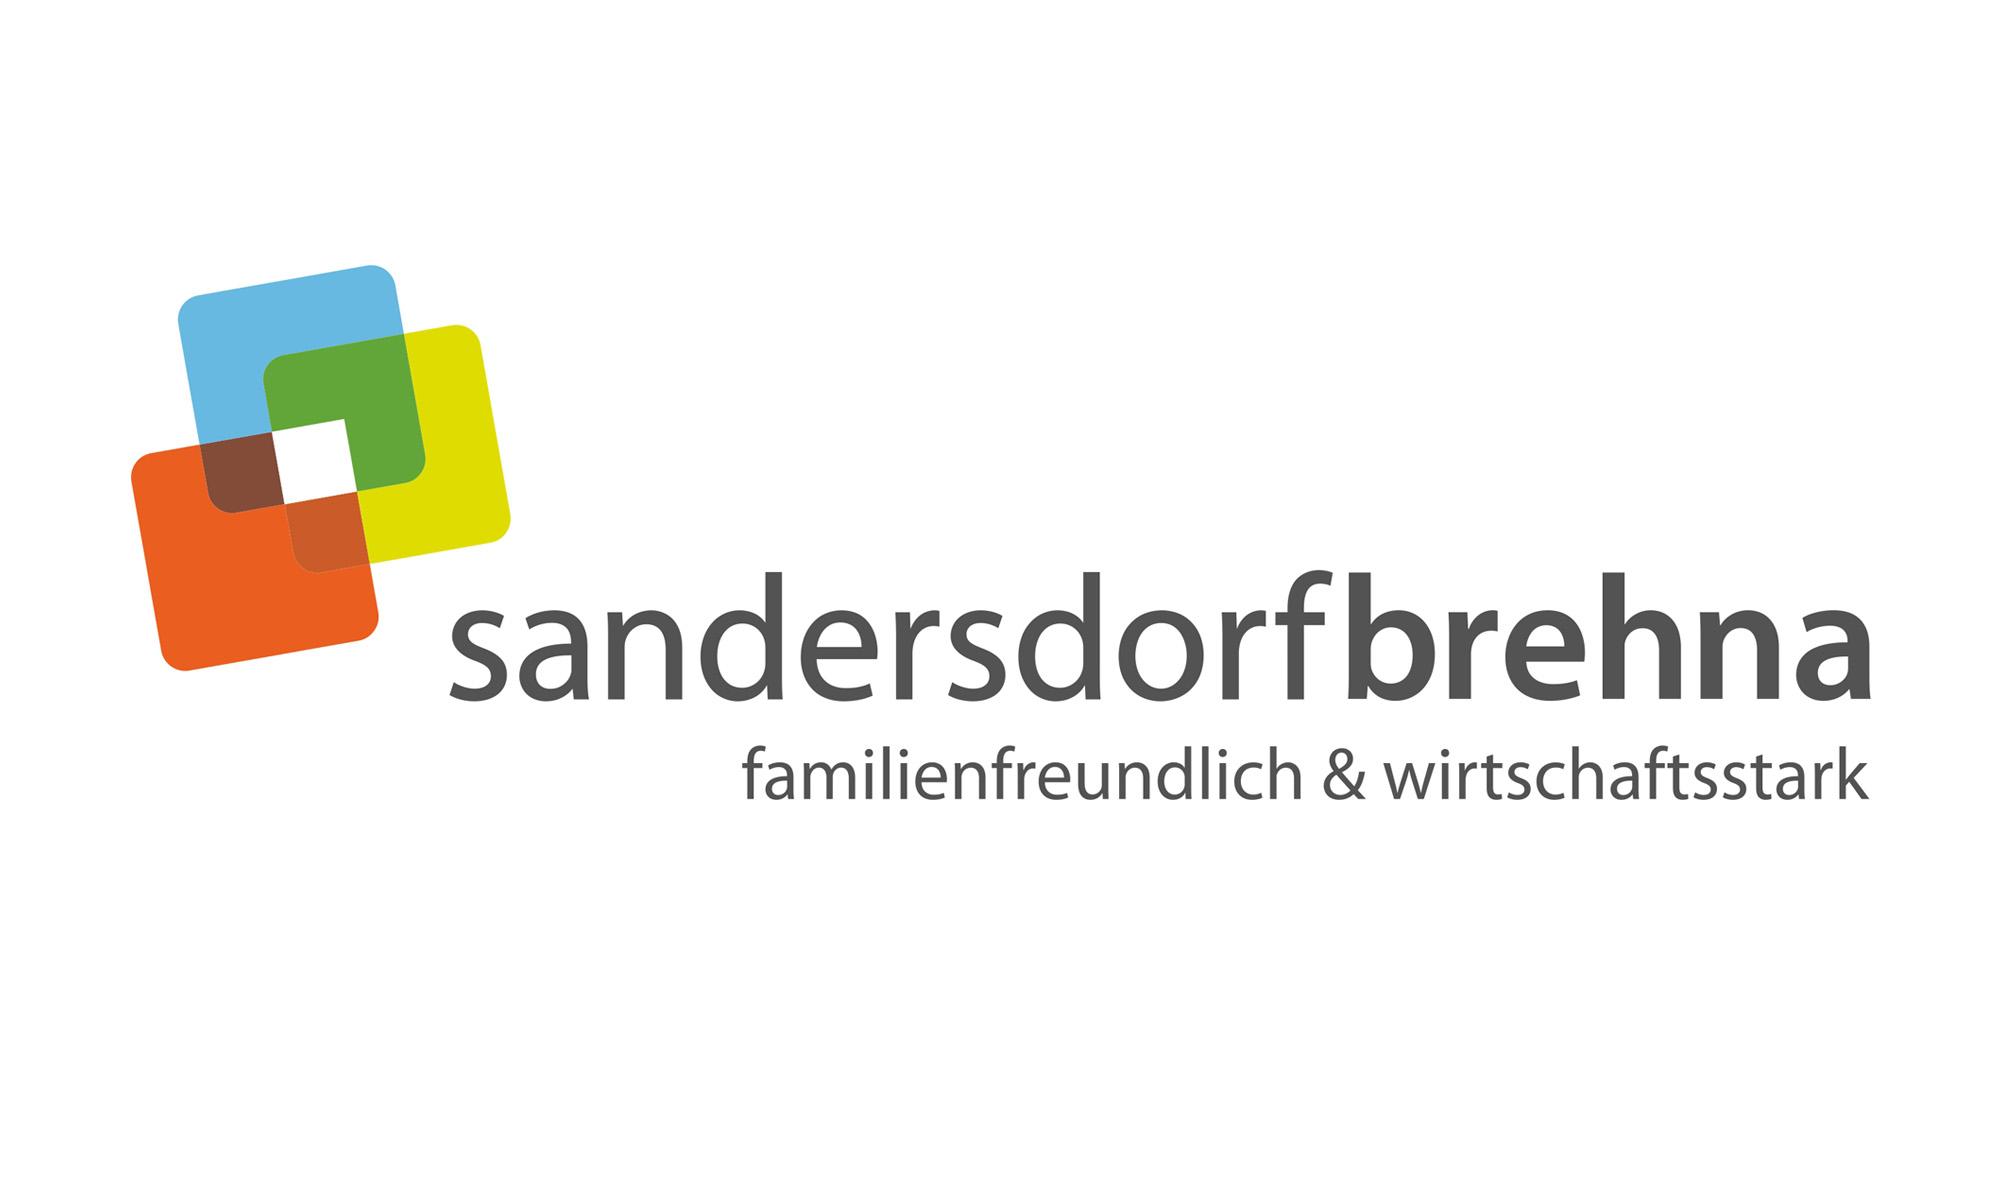 Logo Stadt Sandersdorf-Brehna